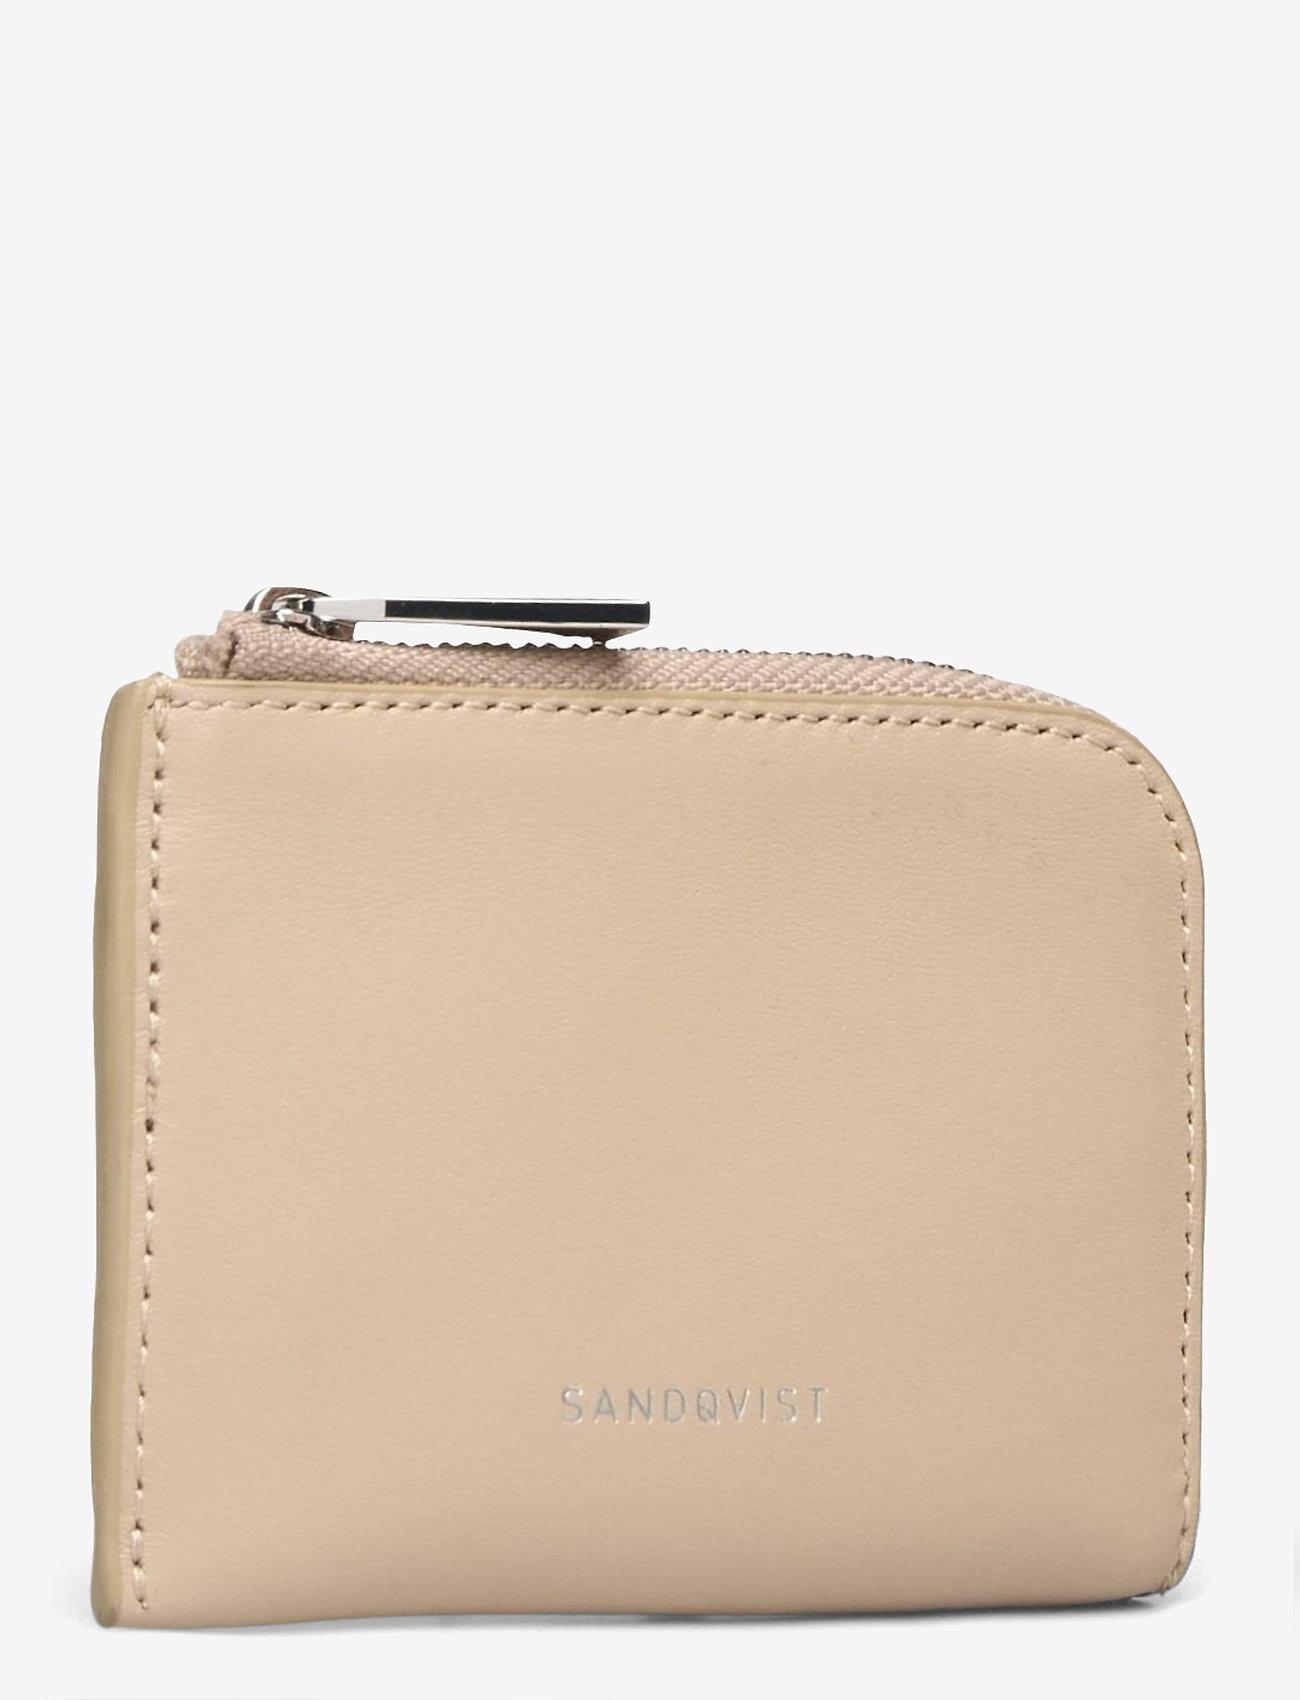 SANDQVIST - EBEN - etui na karty kredytowe - beige - 2